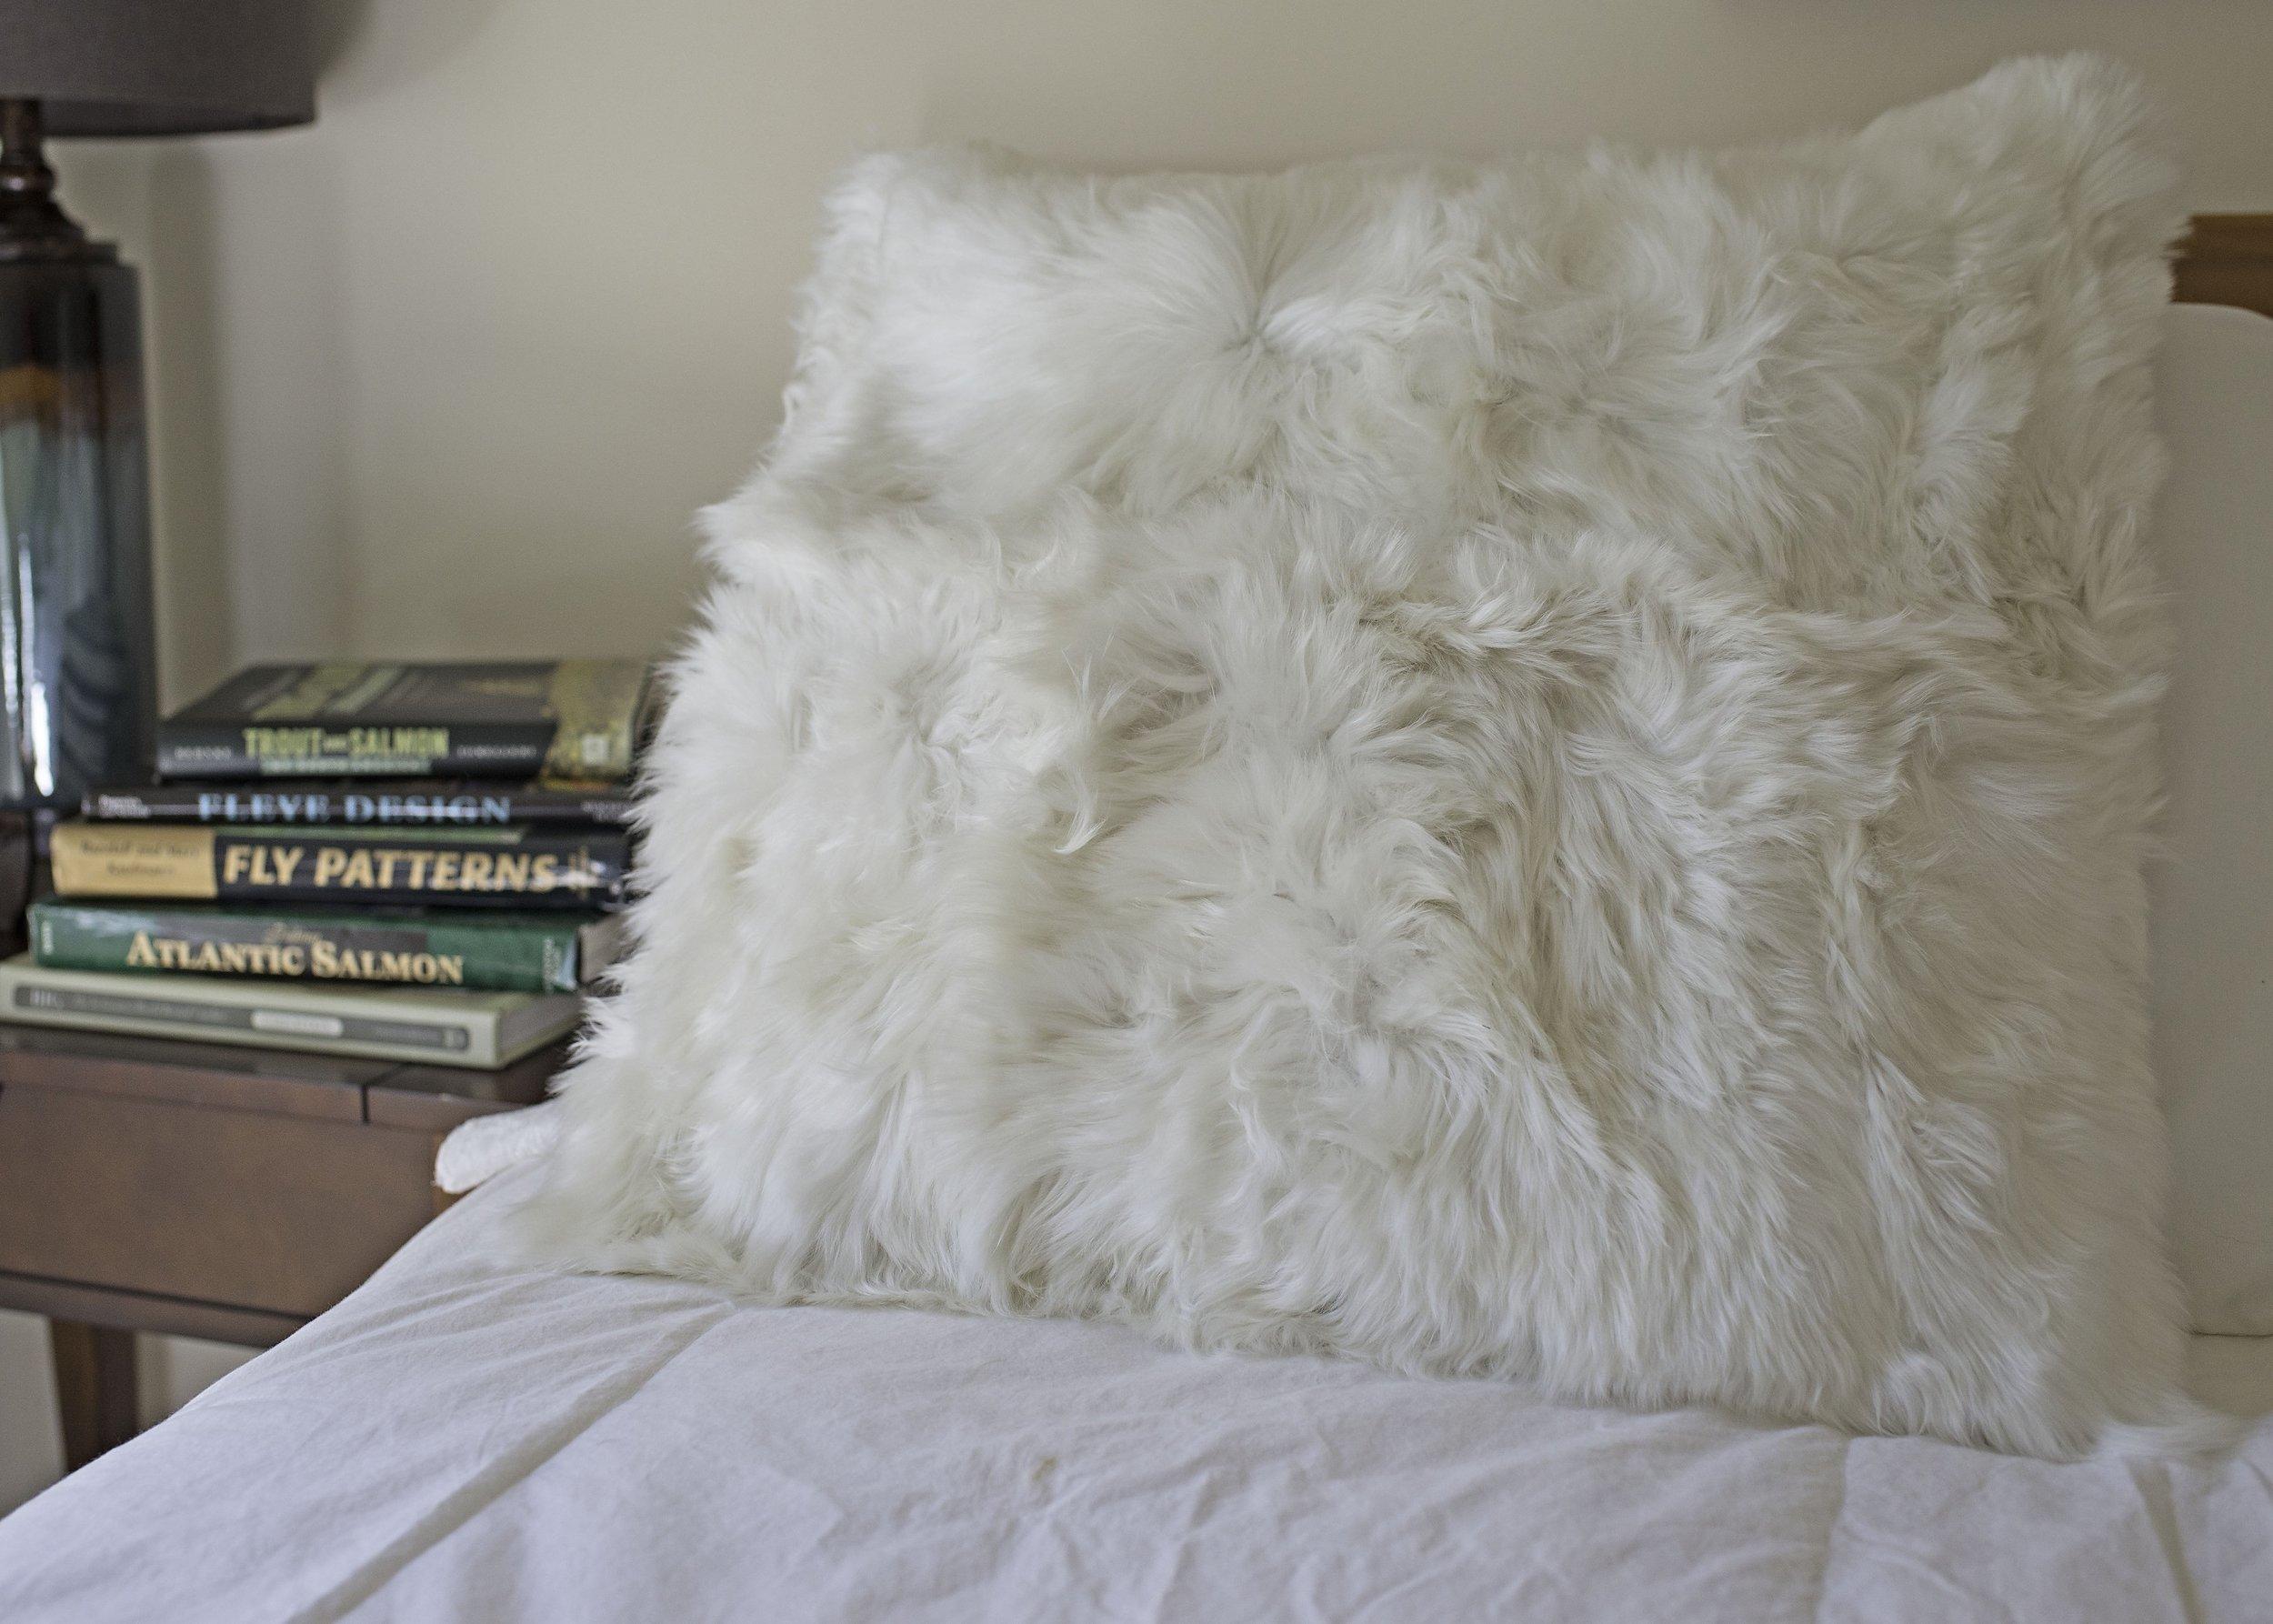 Suri Alpaca pillow, fur pillow in Pearl White